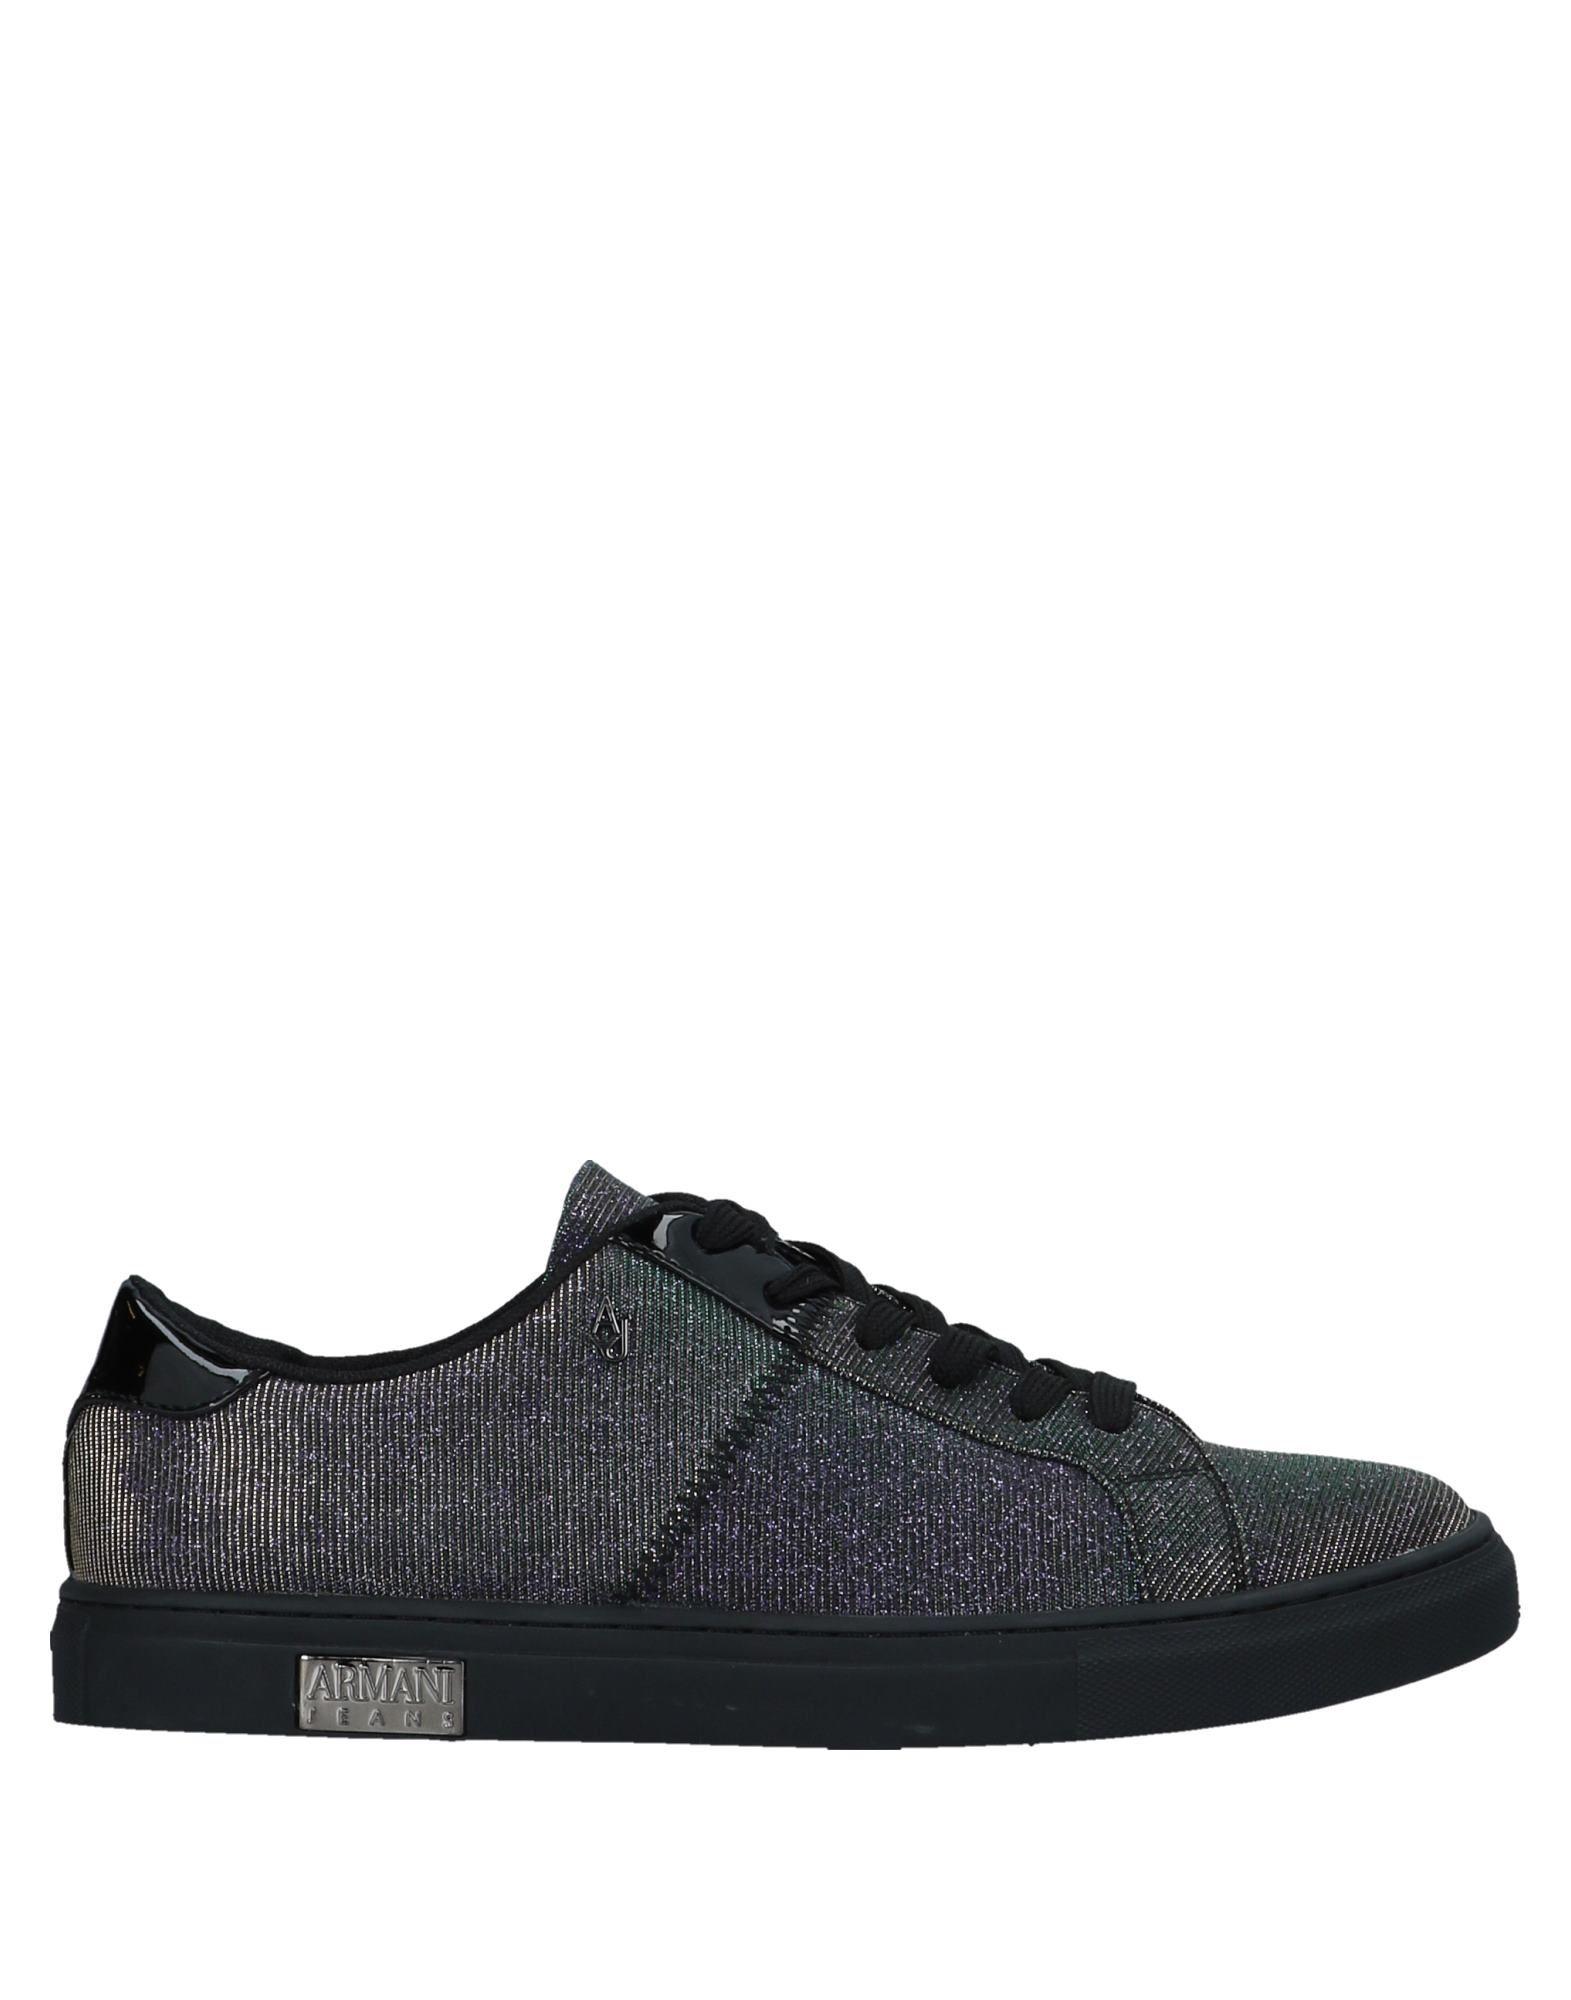 Armani Jeans Sneakers - Women Armani Jeans Sneakers Sneakers Sneakers online on  United Kingdom - 11538248PO 992996